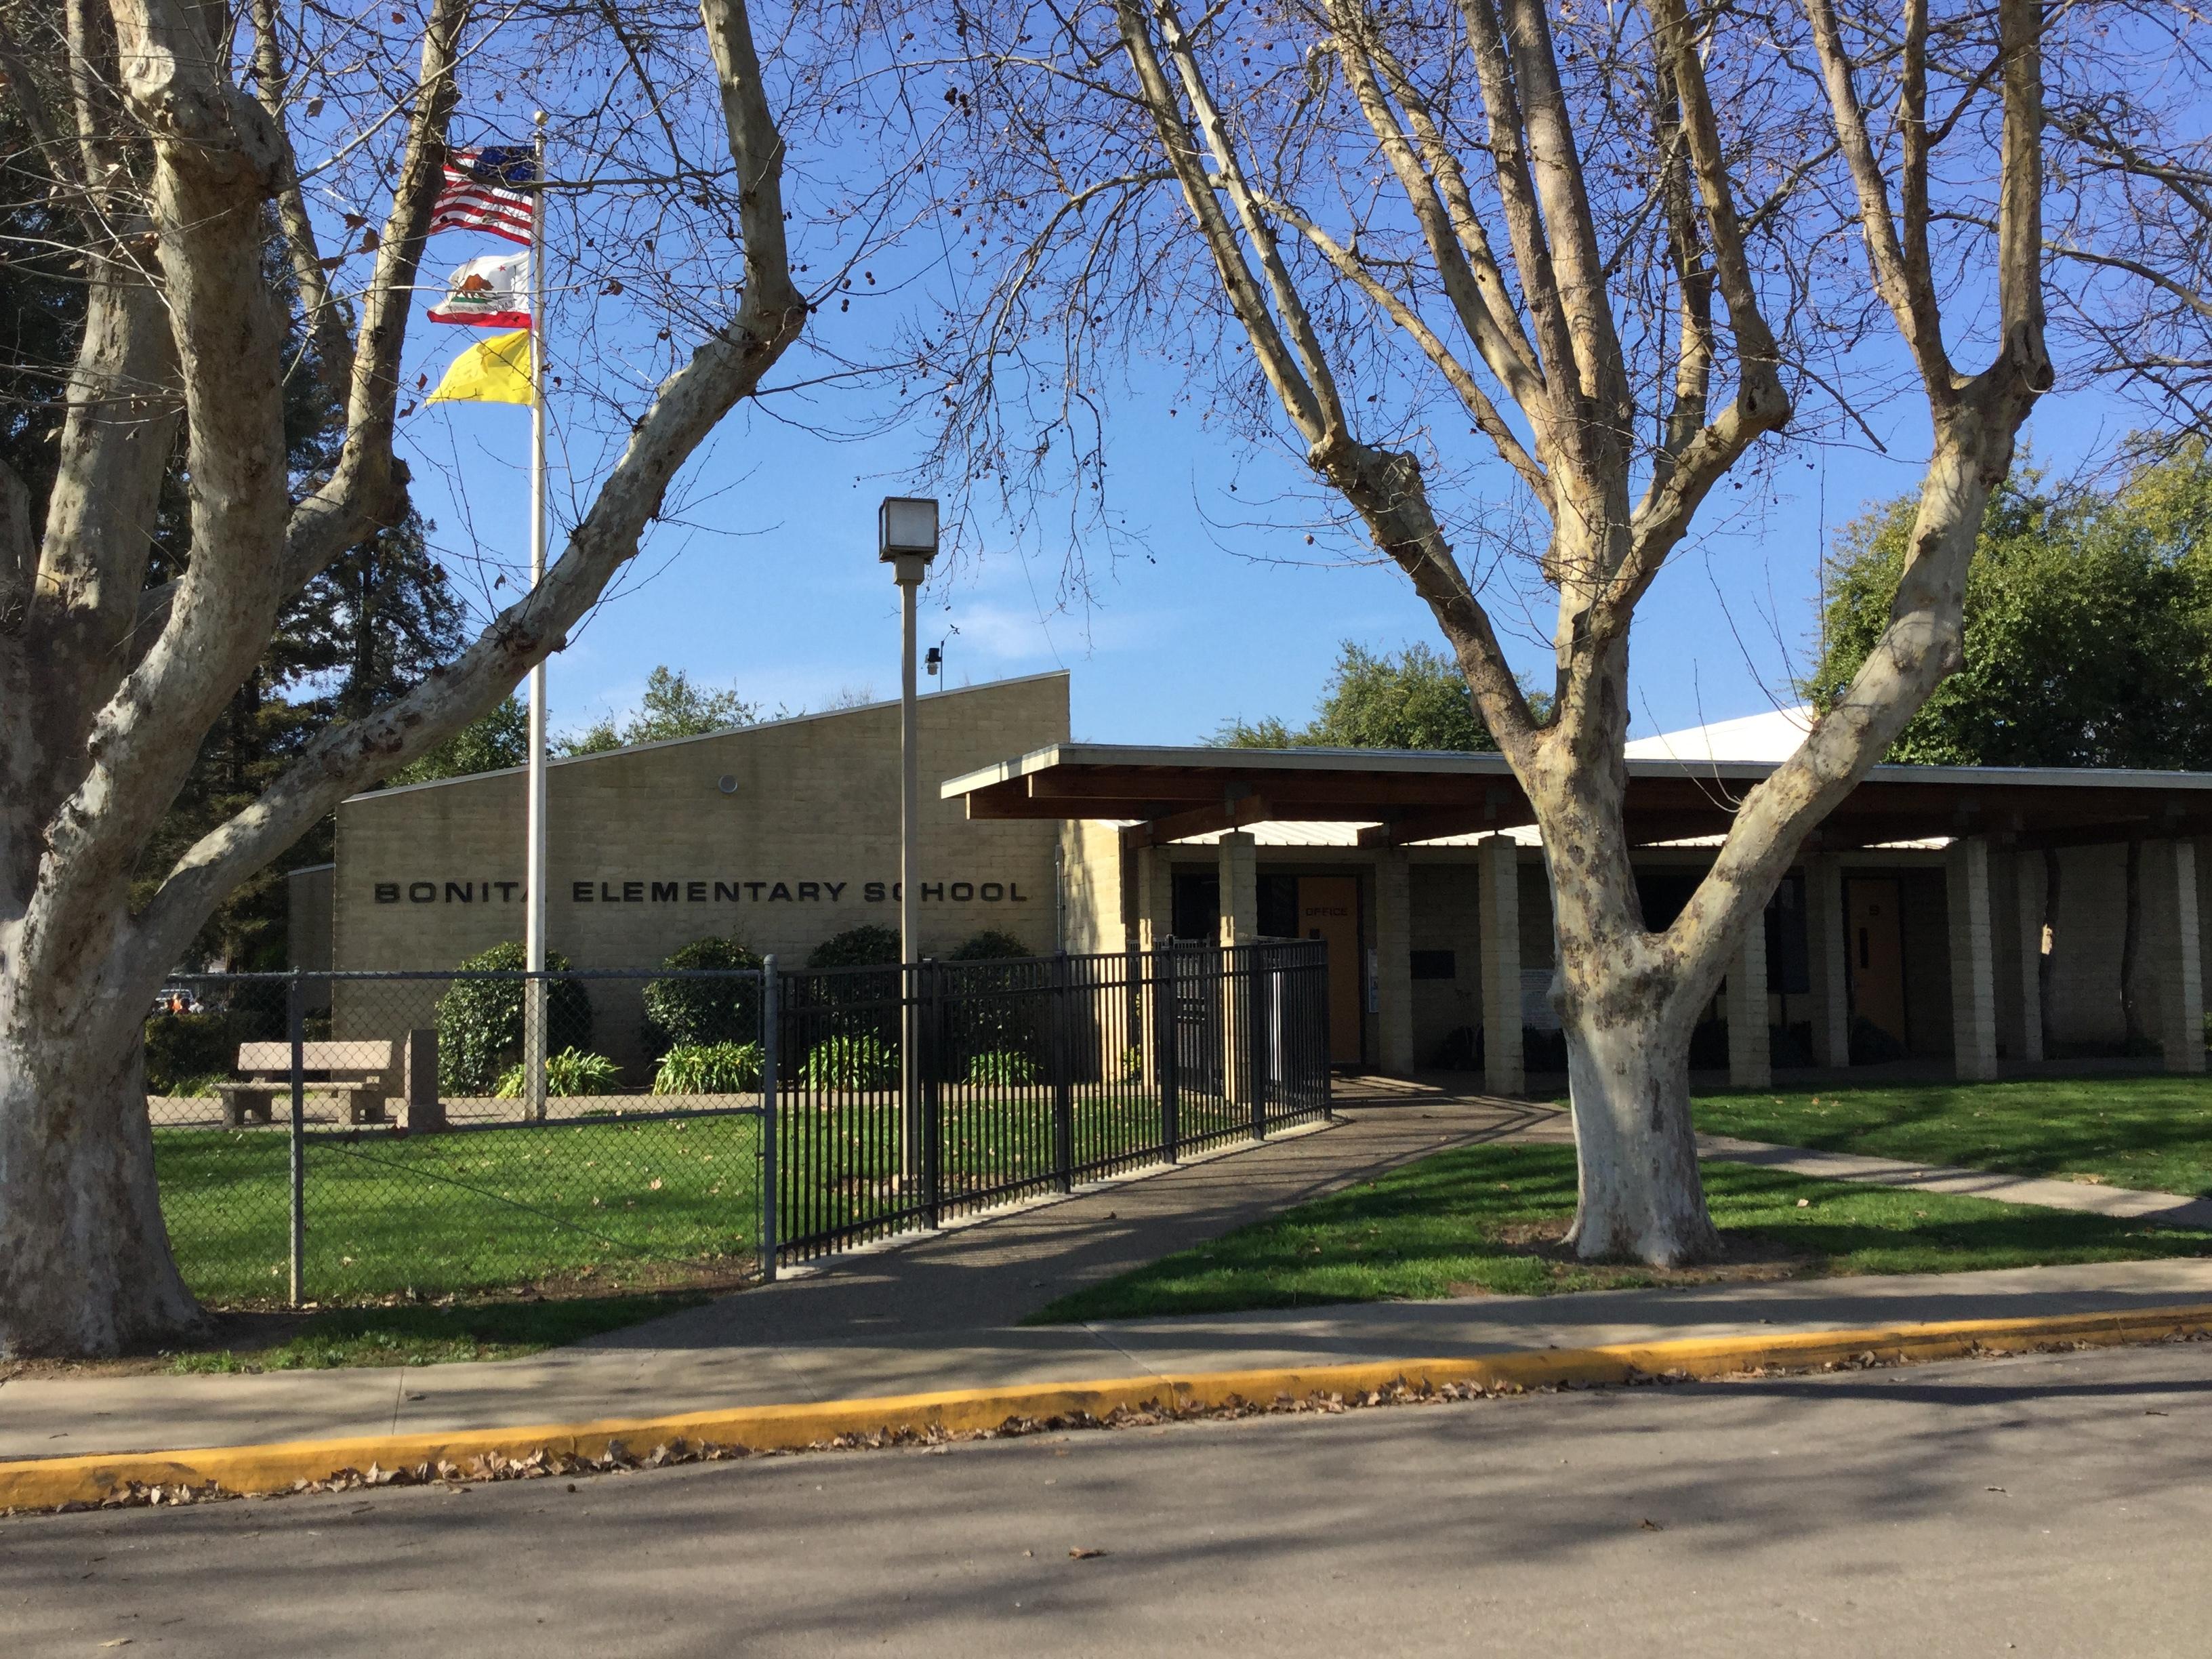 Bonita Elementary School